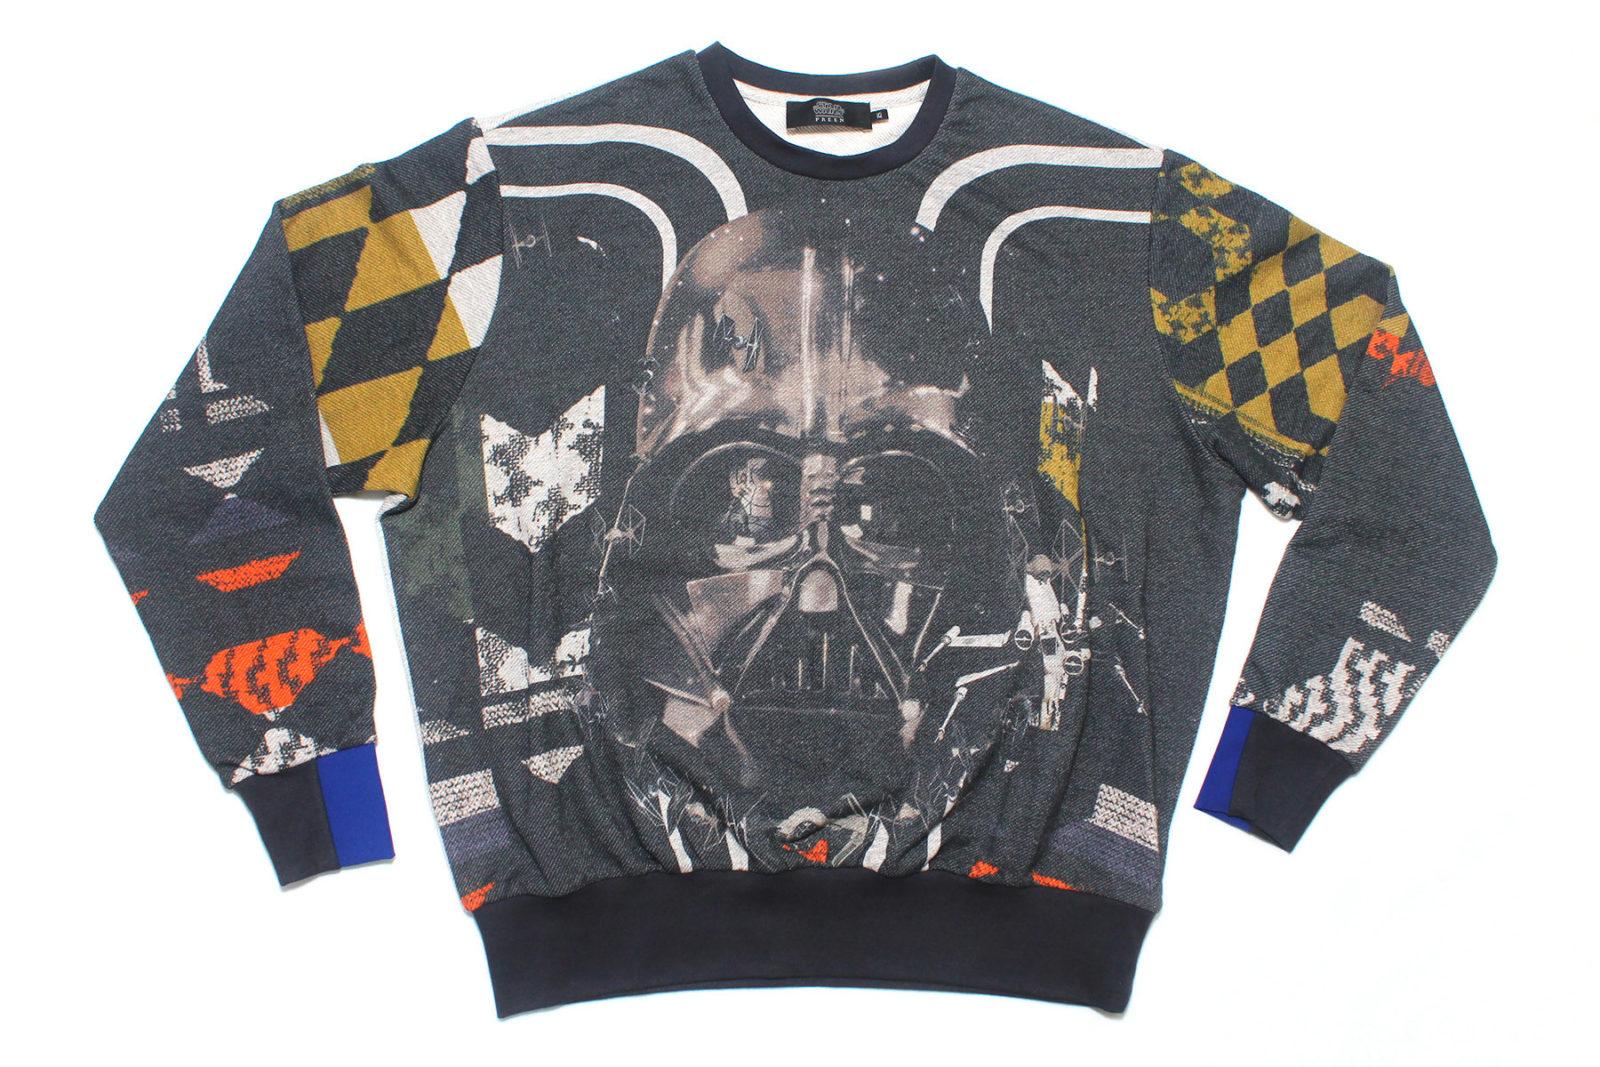 Review – Preen Darth Vader sweatshirt